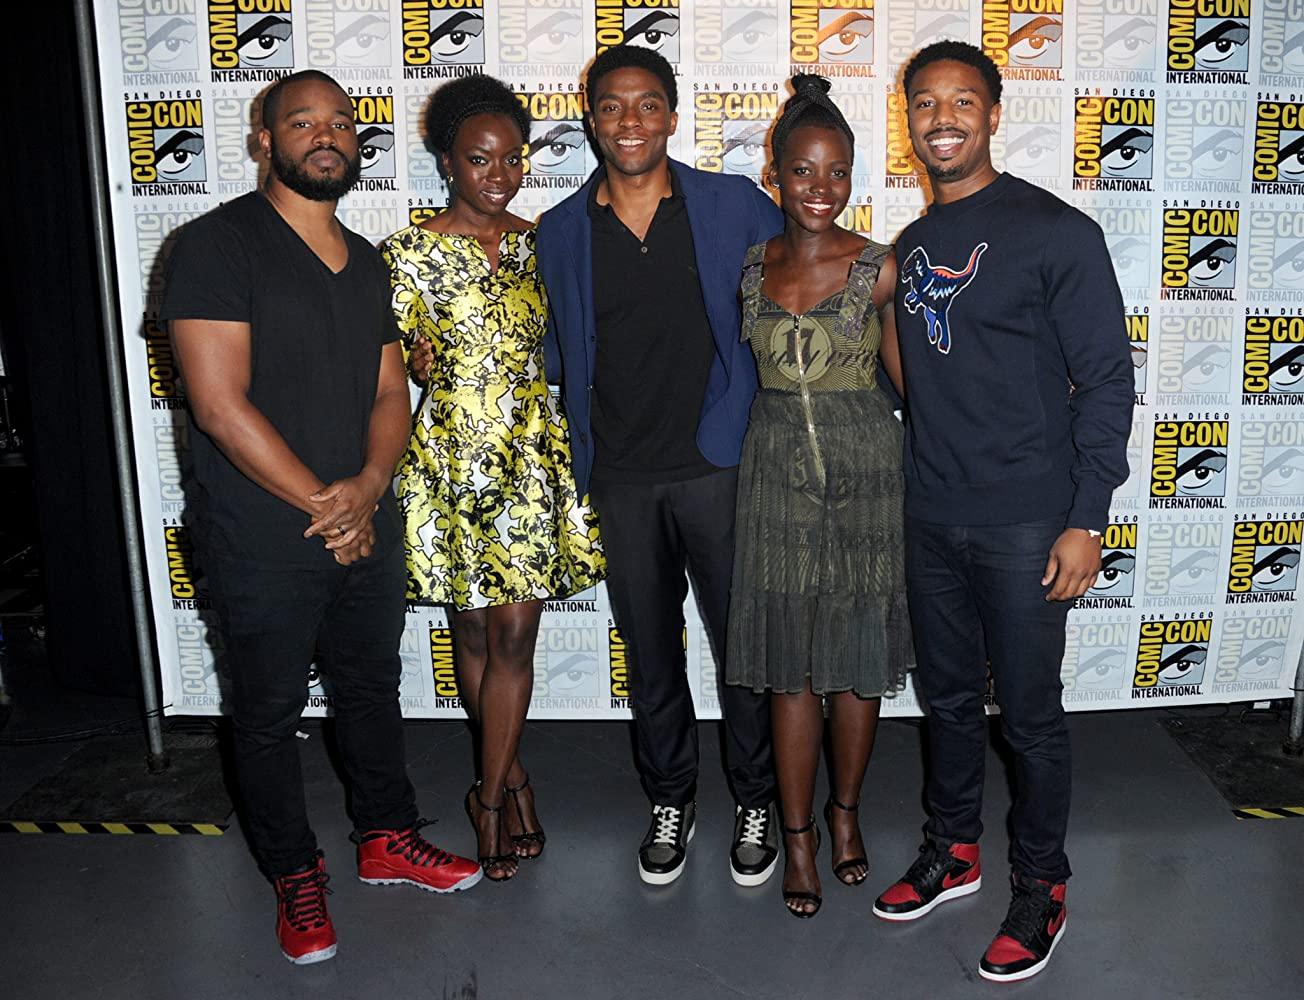 Michael B. Jordan, Chadwick Boseman, Danai Gurira, Lupita Nyong'o, and Ryan Coogler